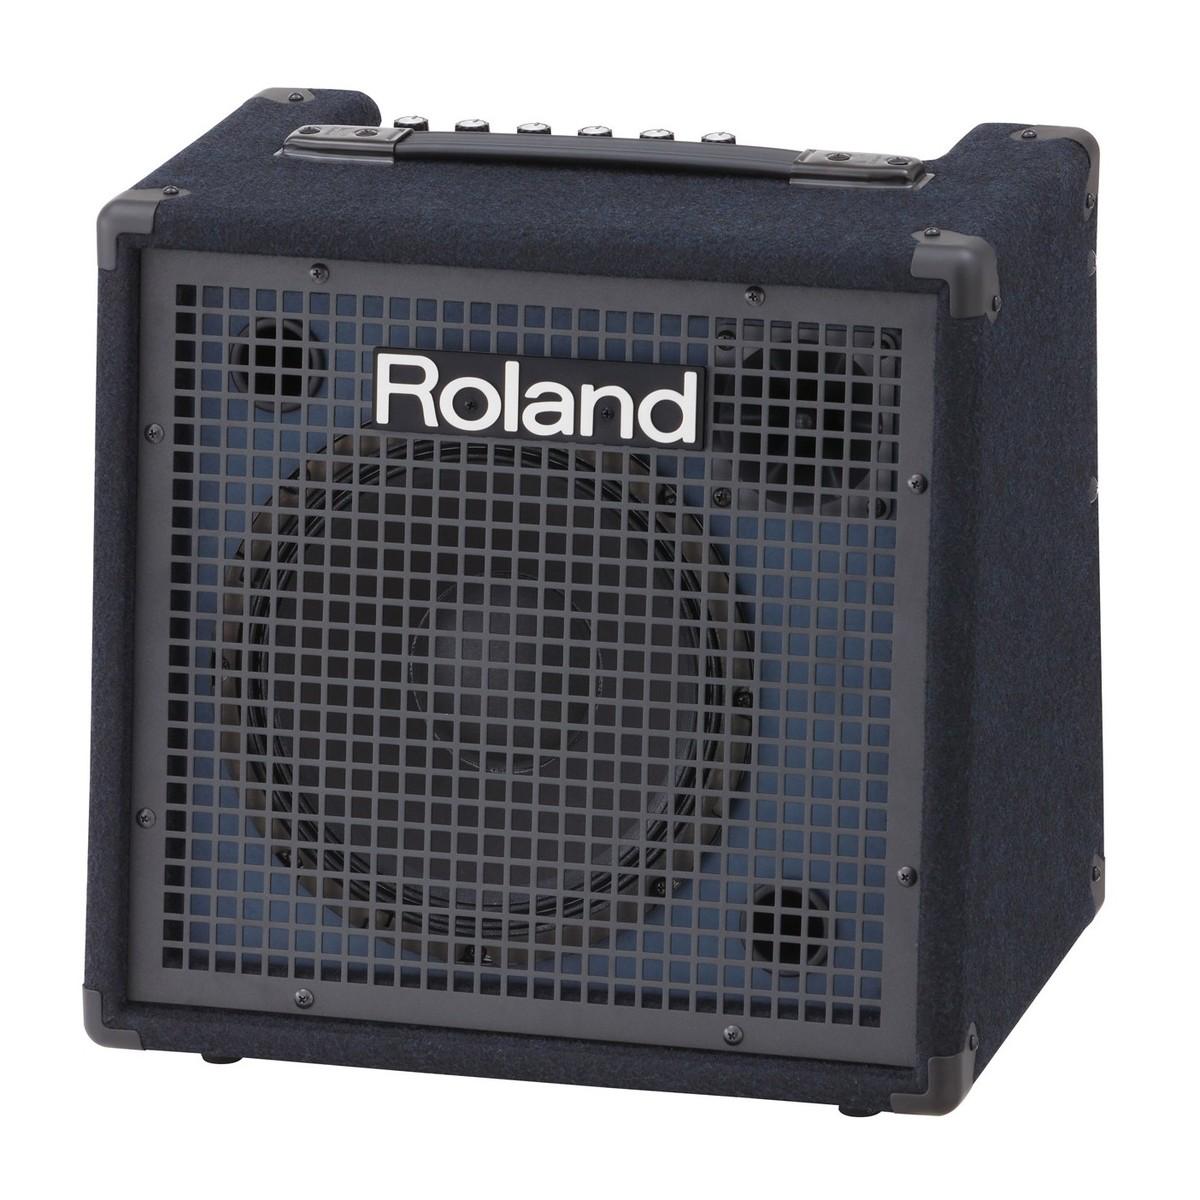 roland kc 80 keyboard amplifier at gear4music. Black Bedroom Furniture Sets. Home Design Ideas